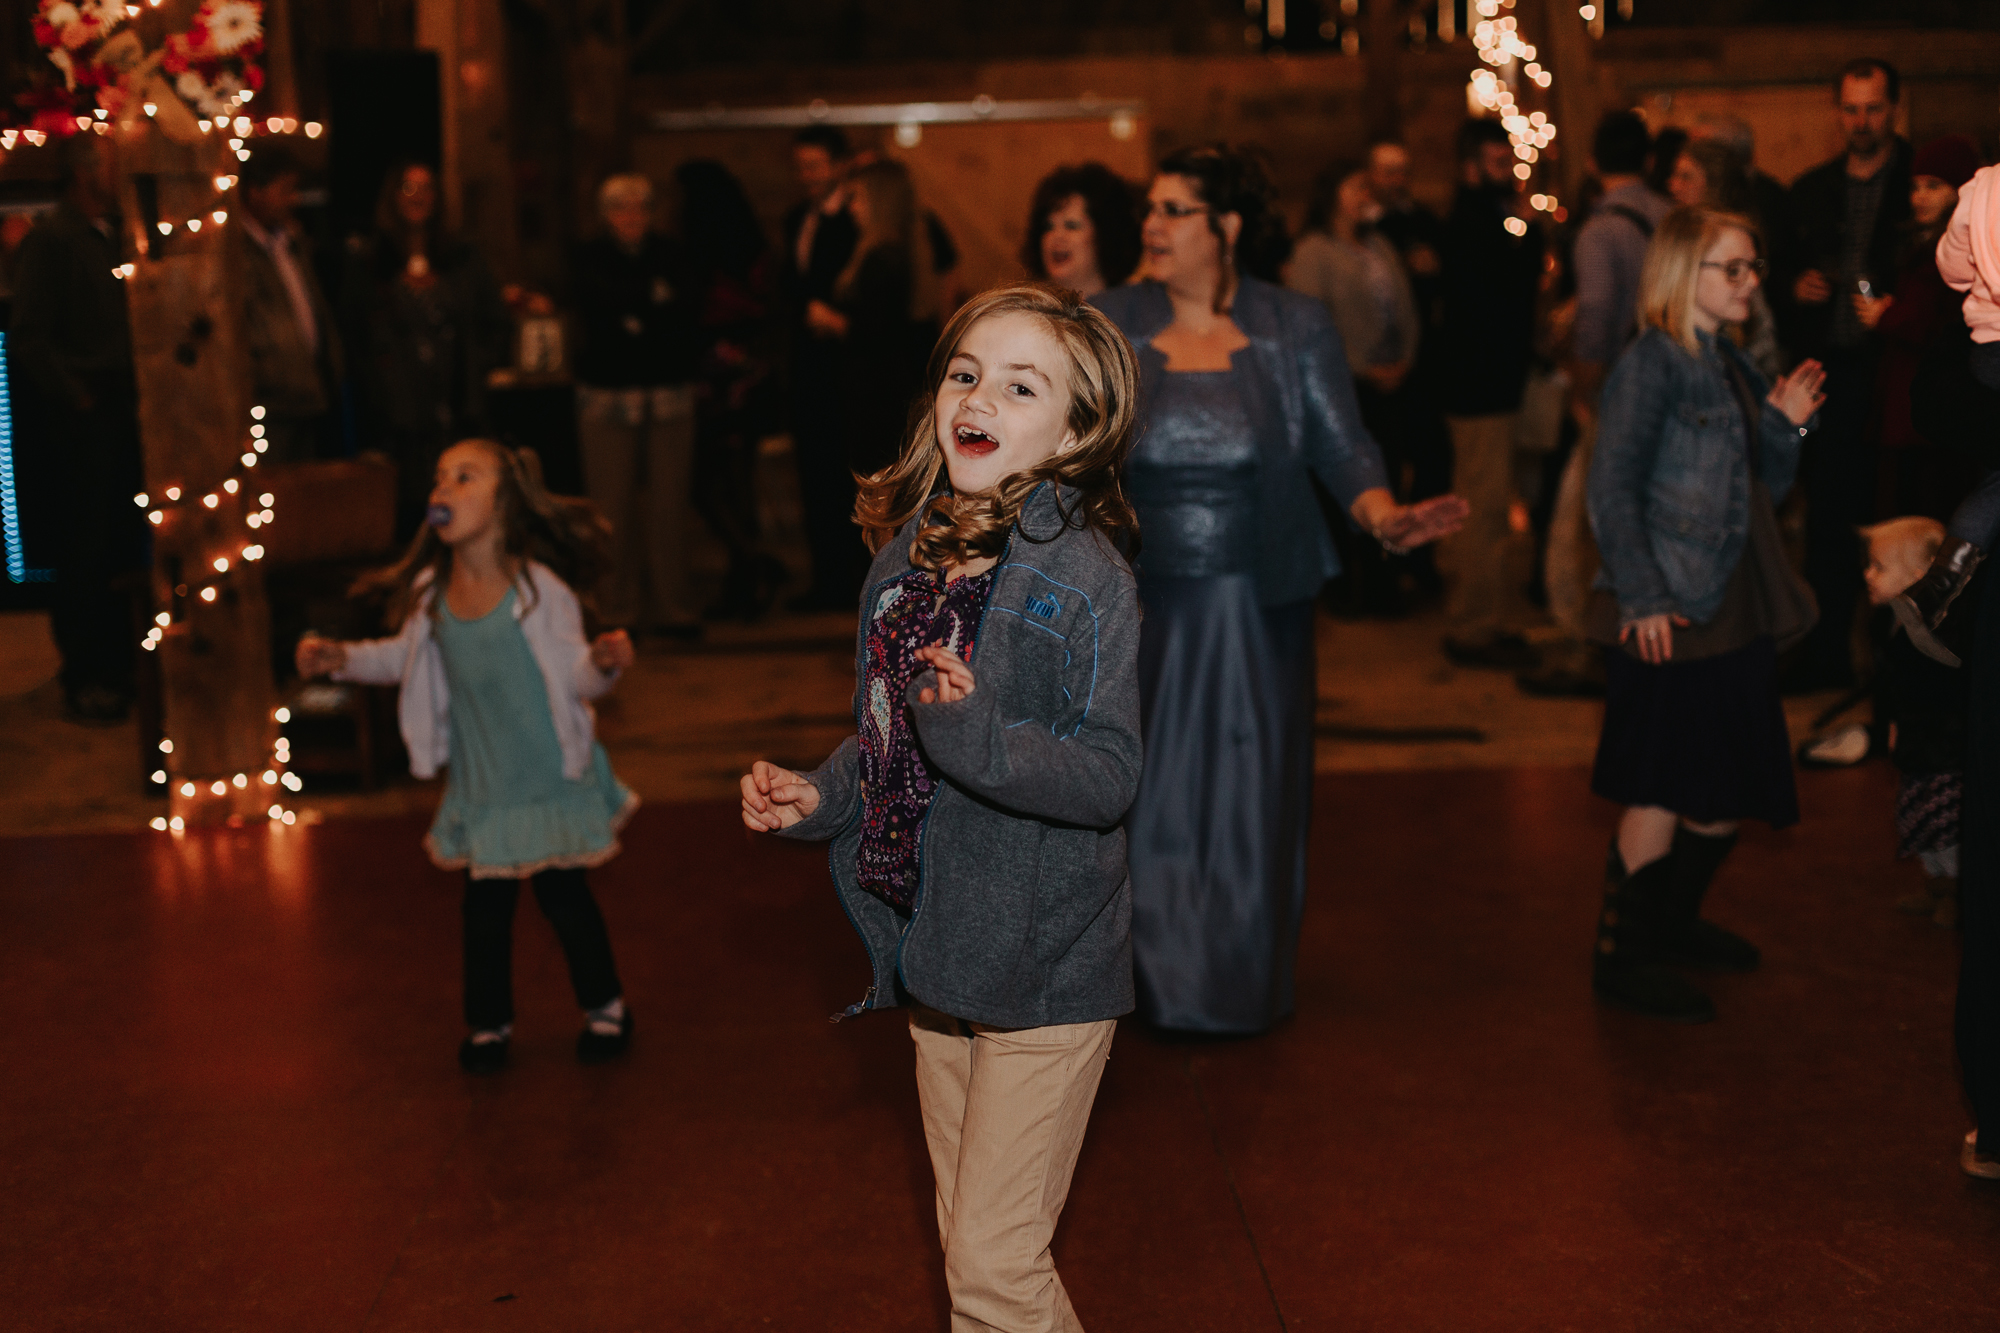 children-reception-dancing-lehigh-valley-wedding-photography